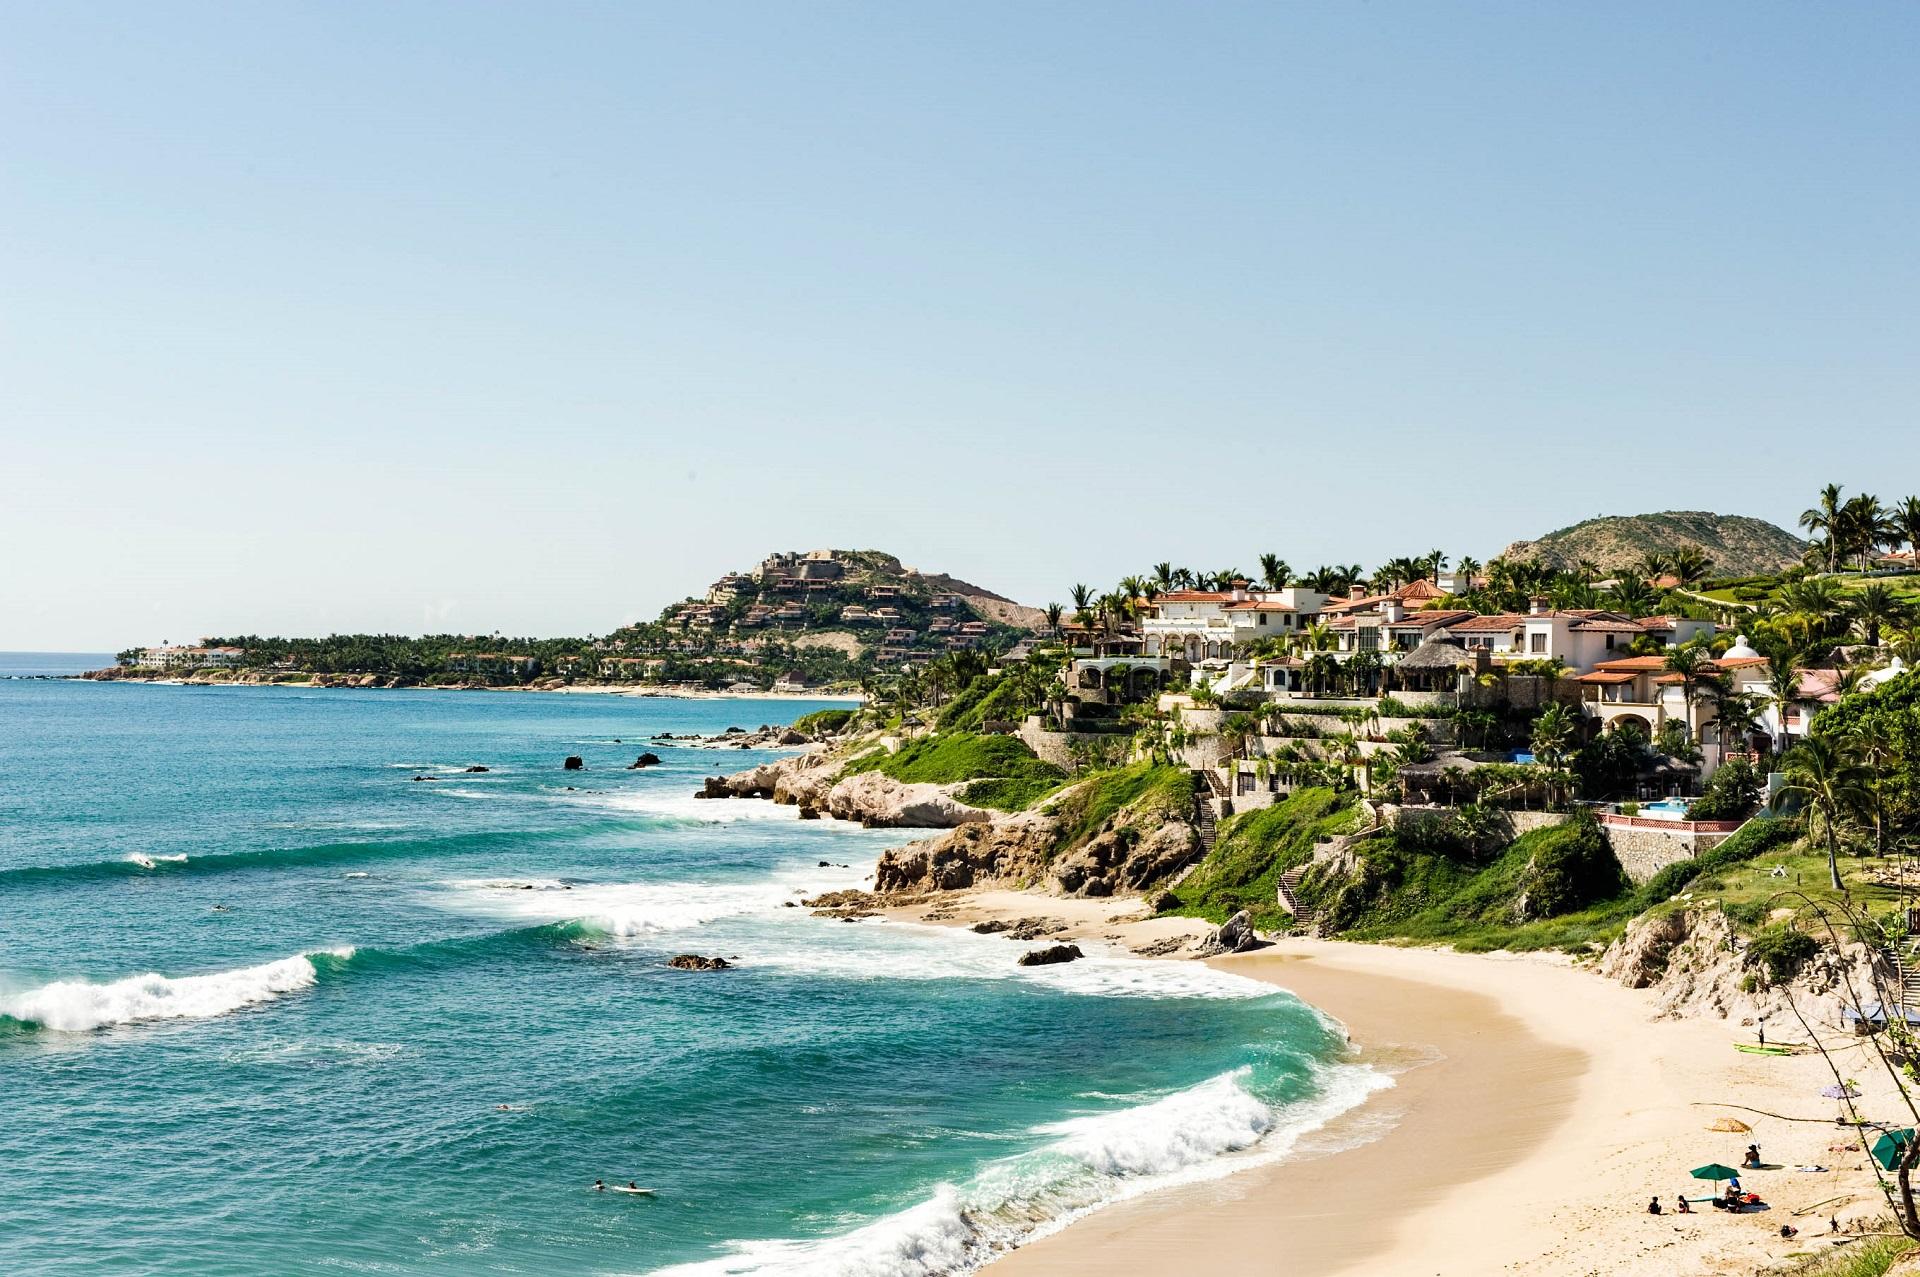 Hotel Riu Palace Cabo San Lucas - Los Cabos Hotels